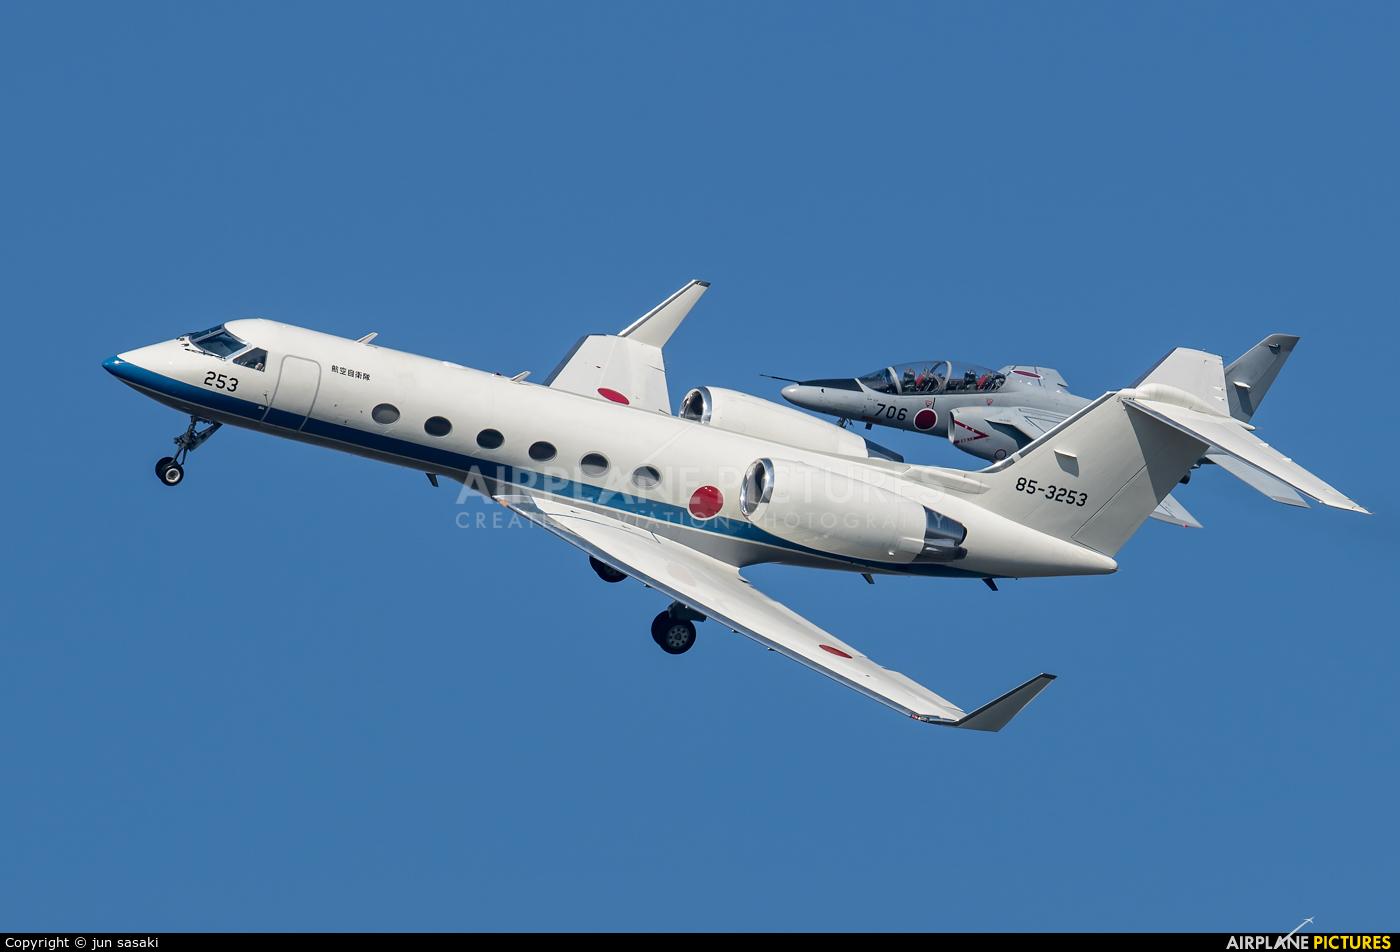 Japan - Air Self Defence Force 85-3253 aircraft at Iruma AB